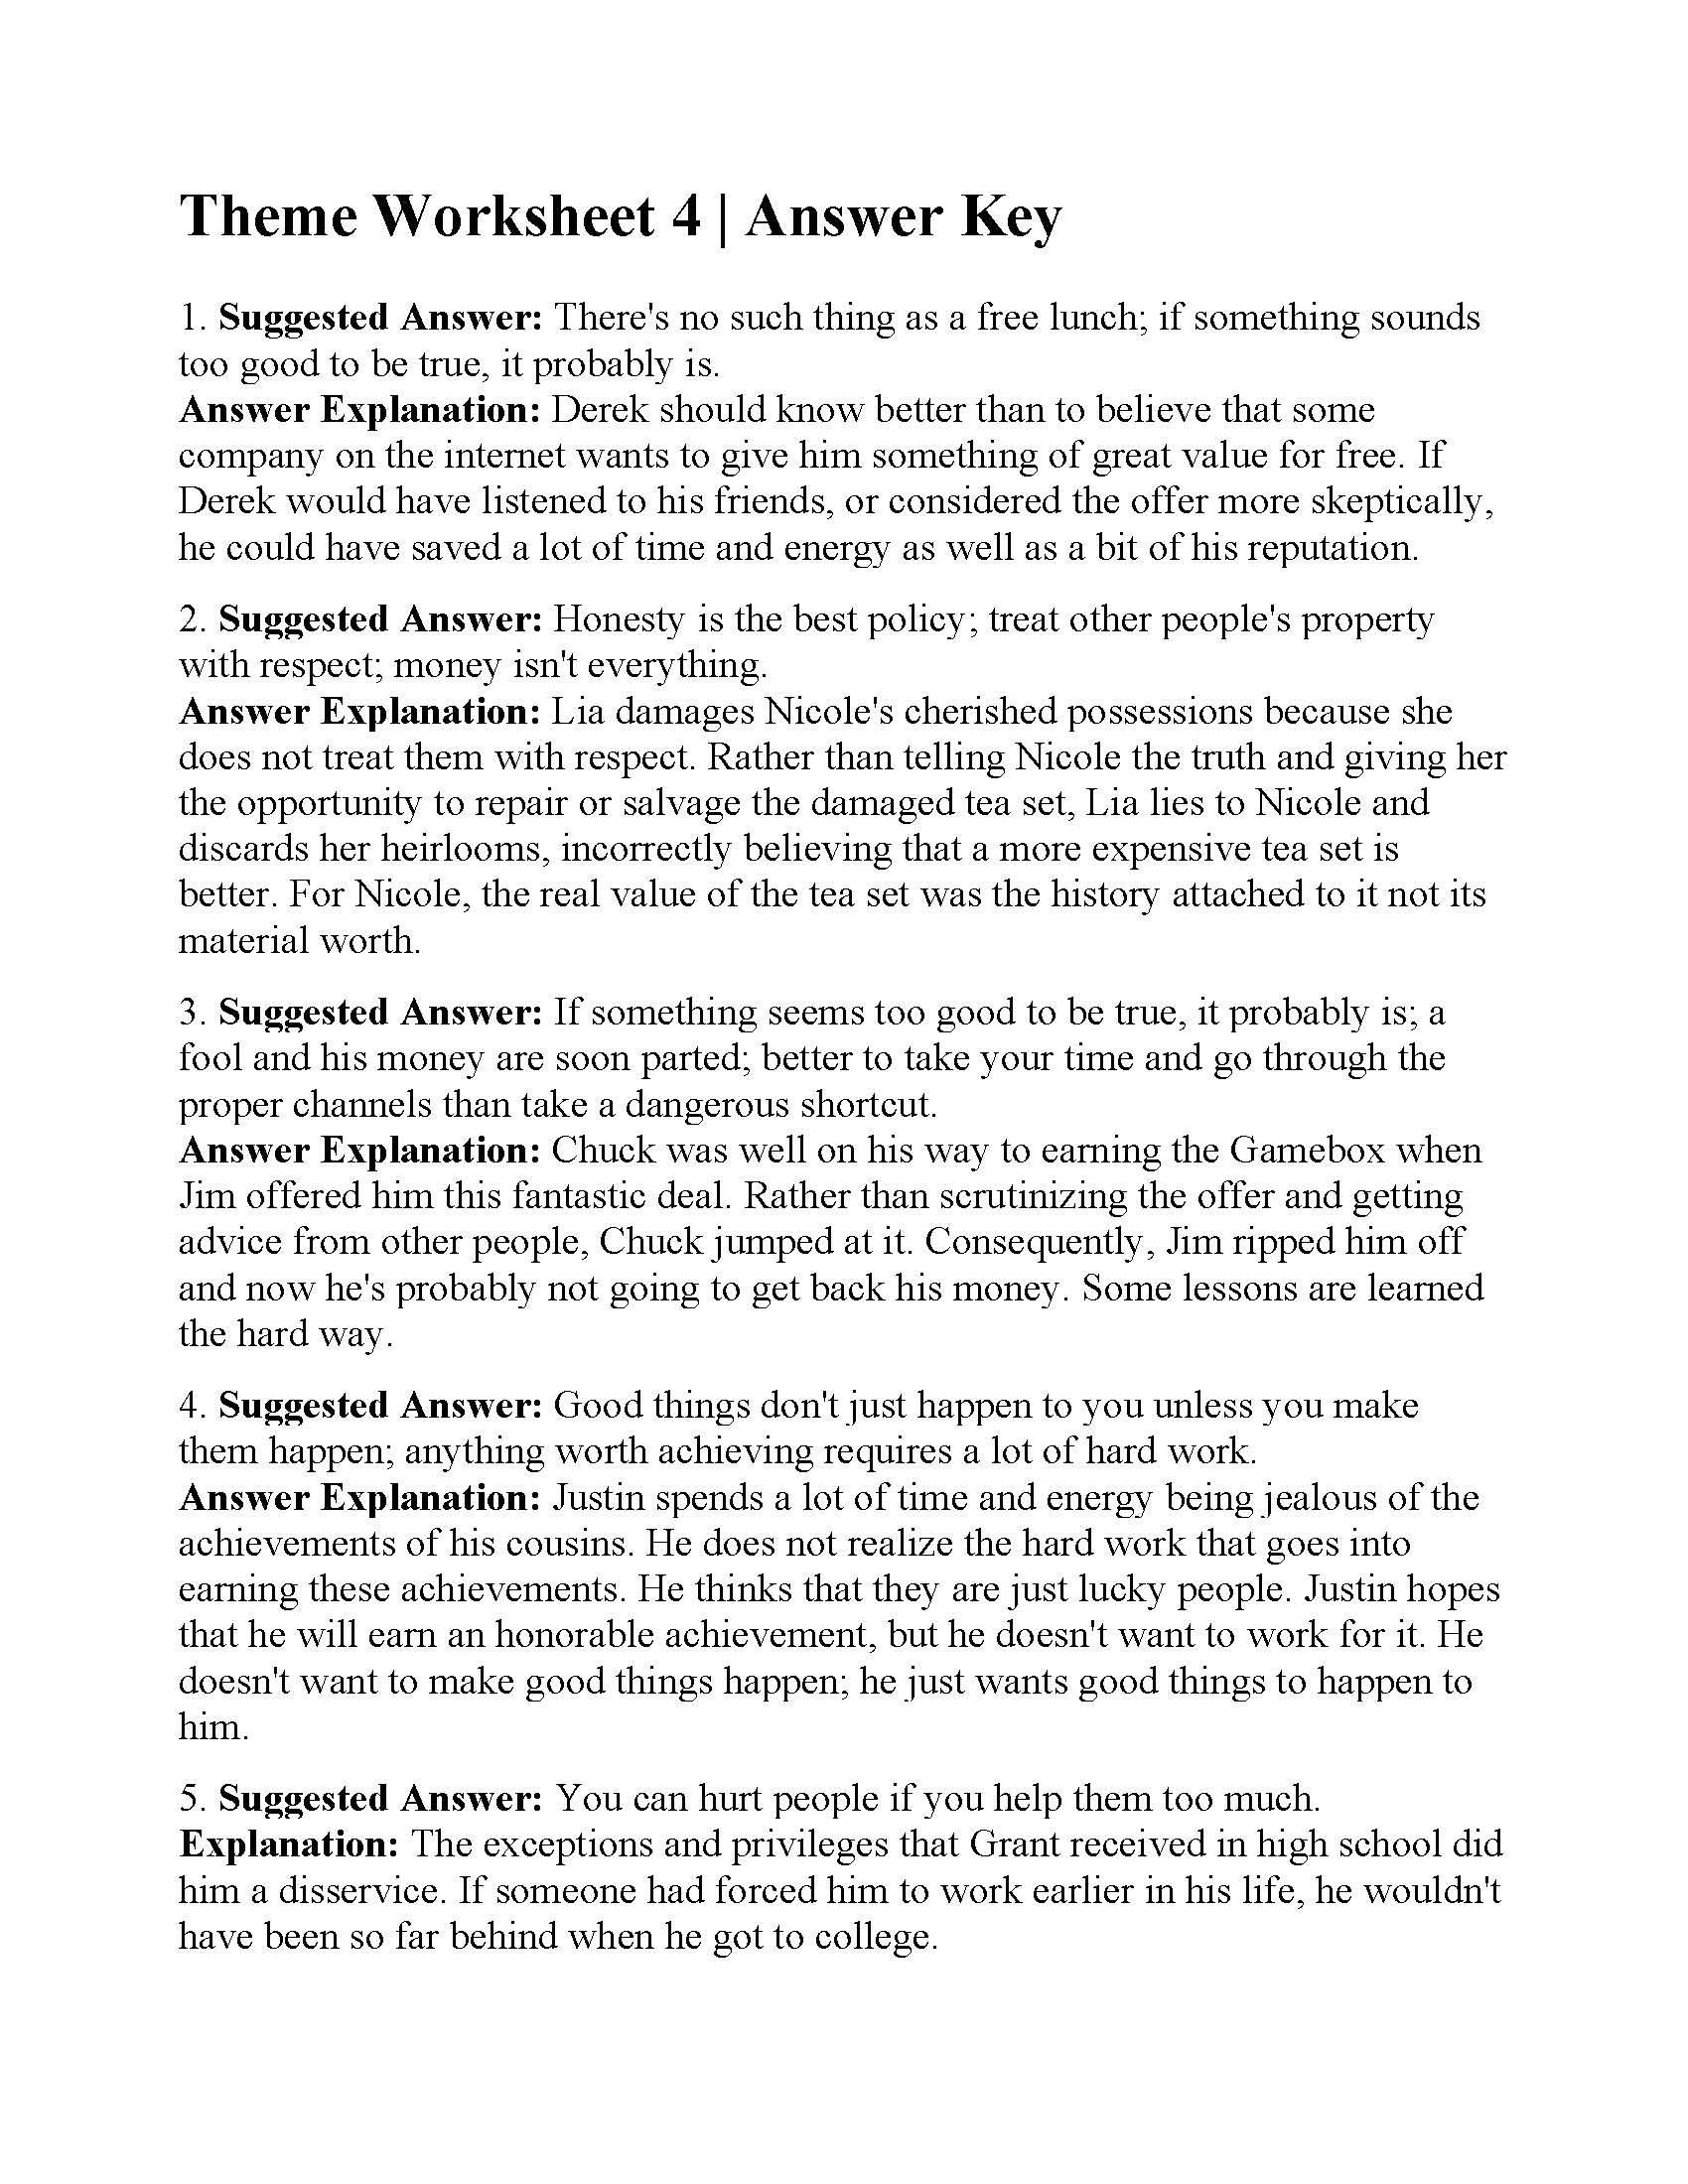 5th Grade theme Worksheets theme Worksheet 4